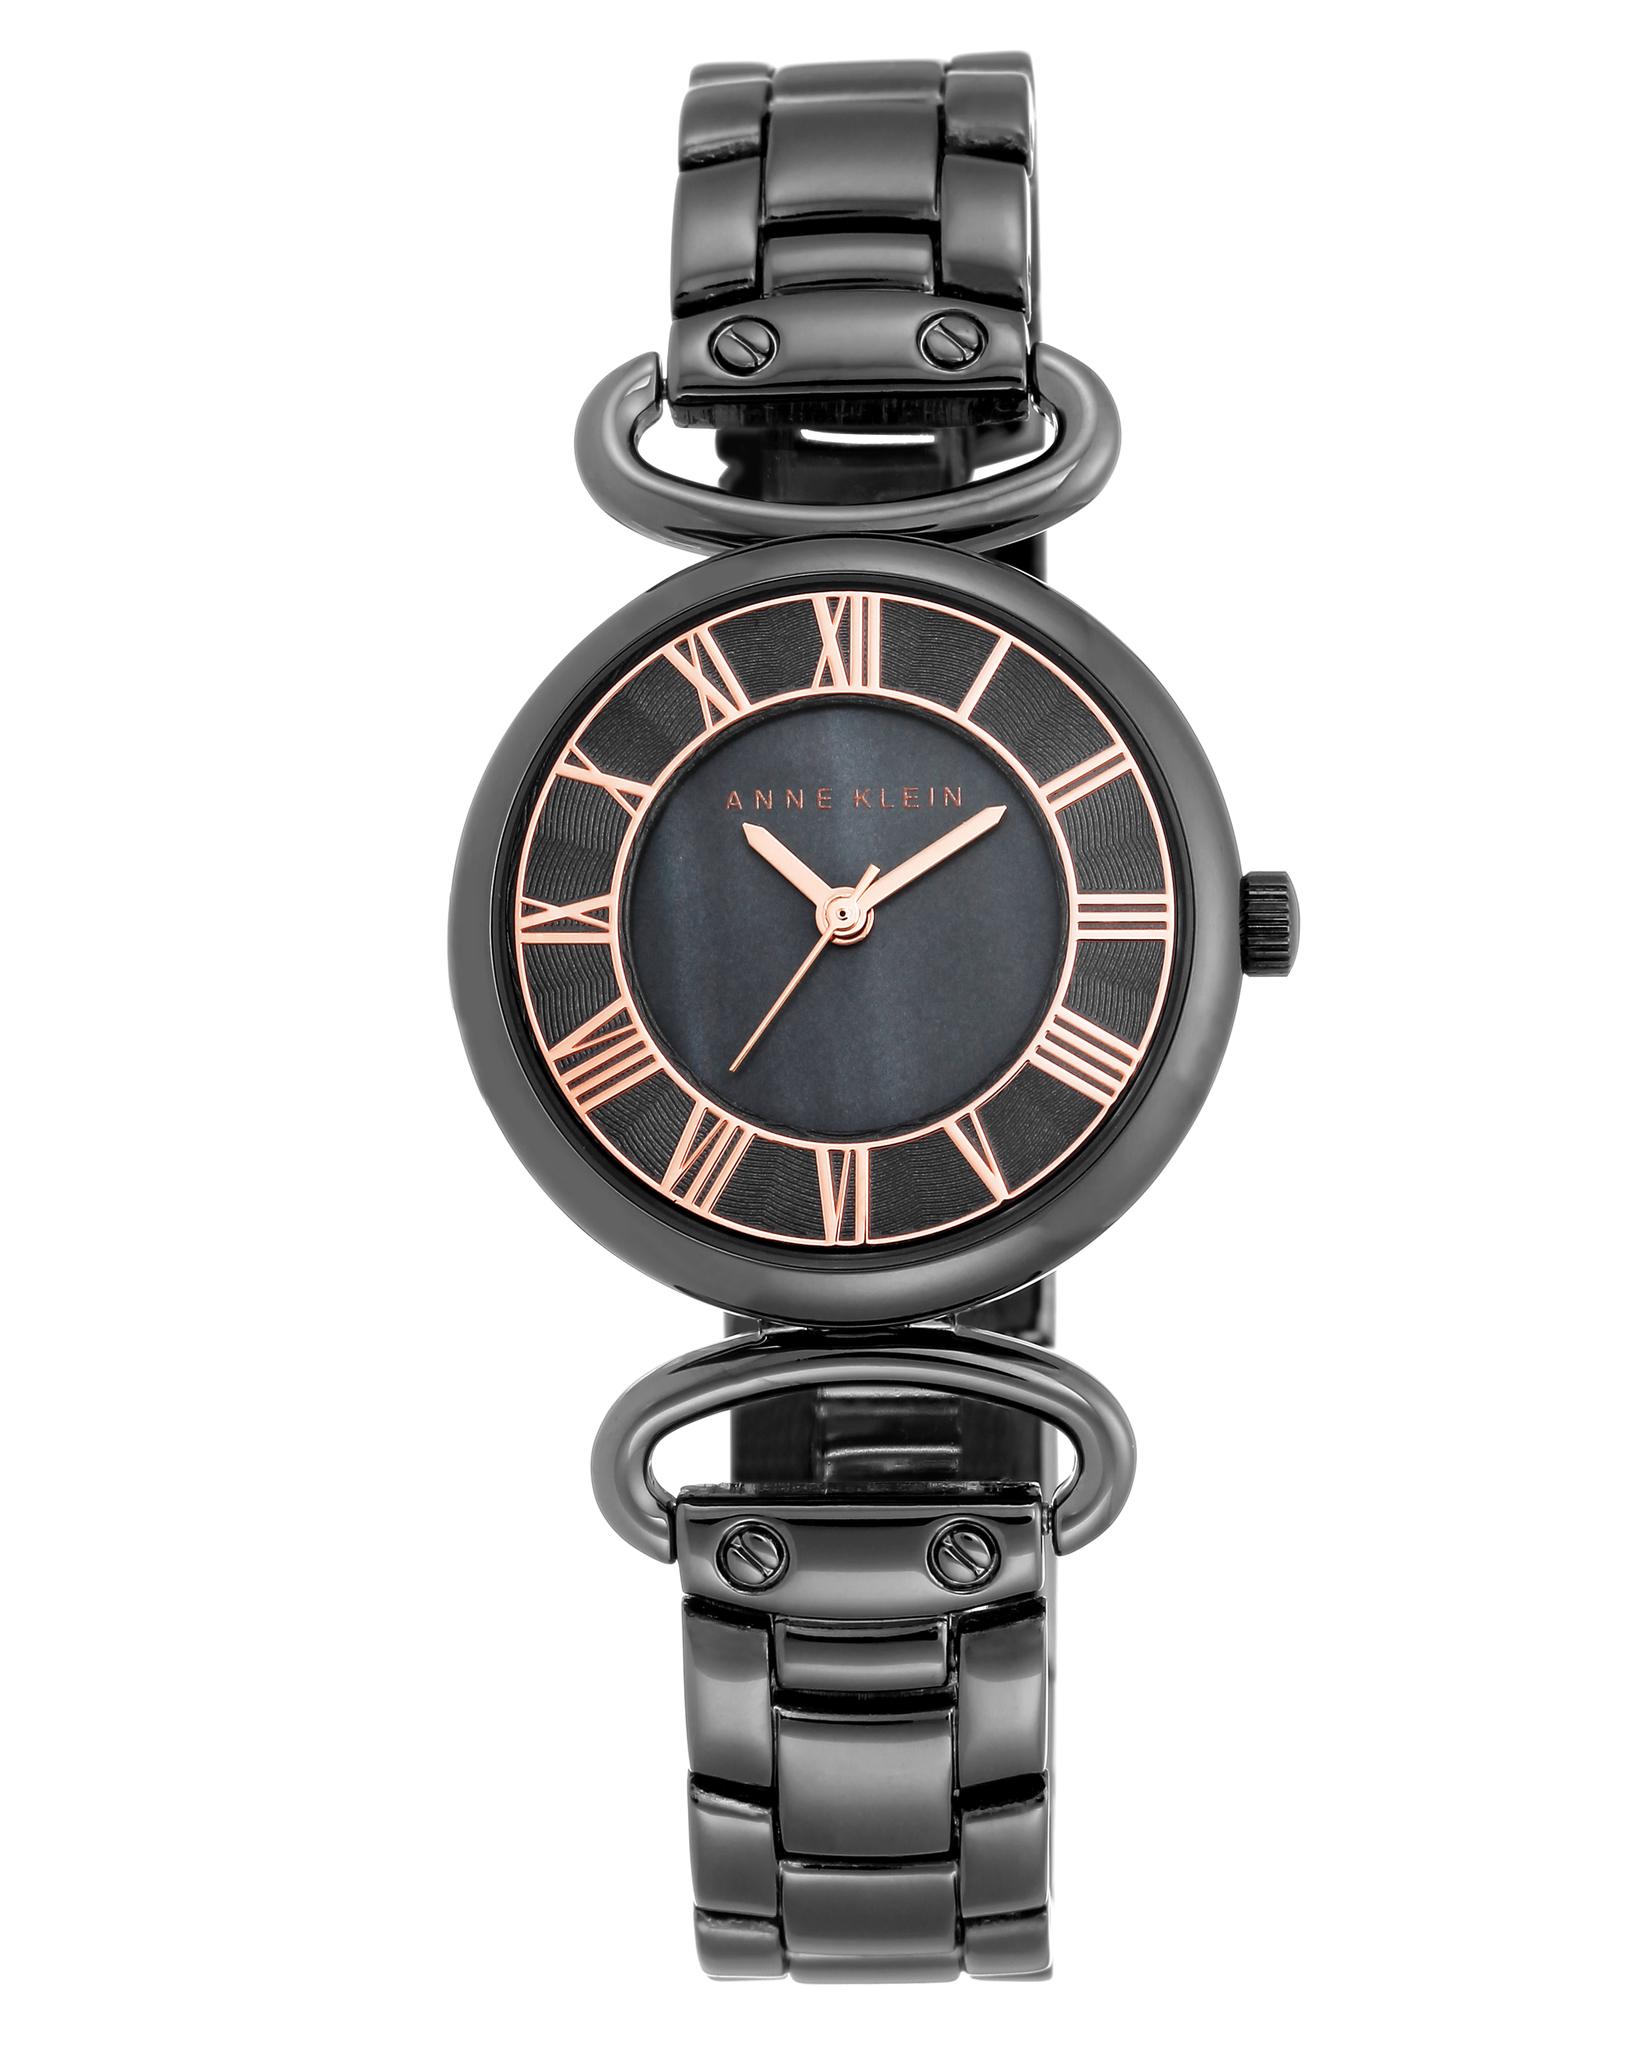 Anne Klein 2123GMRT - женские наручные часы из коллекции RingAnne Klein<br><br><br>Бренд: Anne Klein<br>Модель: Anne Klein 2123 GMRT<br>Артикул: 2123GMRT<br>Вариант артикула: None<br>Коллекция: Ring<br>Подколлекция: None<br>Страна: США<br>Пол: женские<br>Тип механизма: кварцевые<br>Механизм: None<br>Количество камней: None<br>Автоподзавод: None<br>Источник энергии: от батарейки<br>Срок службы элемента питания: None<br>Дисплей: стрелки<br>Цифры: римские<br>Водозащита: WR 30<br>Противоударные: None<br>Материал корпуса: не указан, PVD покрытие (полное)<br>Материал браслета: не указан, PVD покрытие (полное)<br>Материал безеля: None<br>Стекло: минеральное<br>Антибликовое покрытие: None<br>Цвет корпуса: None<br>Цвет браслета: None<br>Цвет циферблата: None<br>Цвет безеля: None<br>Размеры: 30 мм<br>Диаметр: None<br>Диаметр корпуса: None<br>Толщина: None<br>Ширина ремешка: None<br>Вес: None<br>Спорт-функции: None<br>Подсветка: None<br>Вставка: None<br>Отображение даты: None<br>Хронограф: None<br>Таймер: None<br>Термометр: None<br>Хронометр: None<br>GPS: None<br>Радиосинхронизация: None<br>Барометр: None<br>Скелетон: None<br>Дополнительная информация: None<br>Дополнительные функции: None